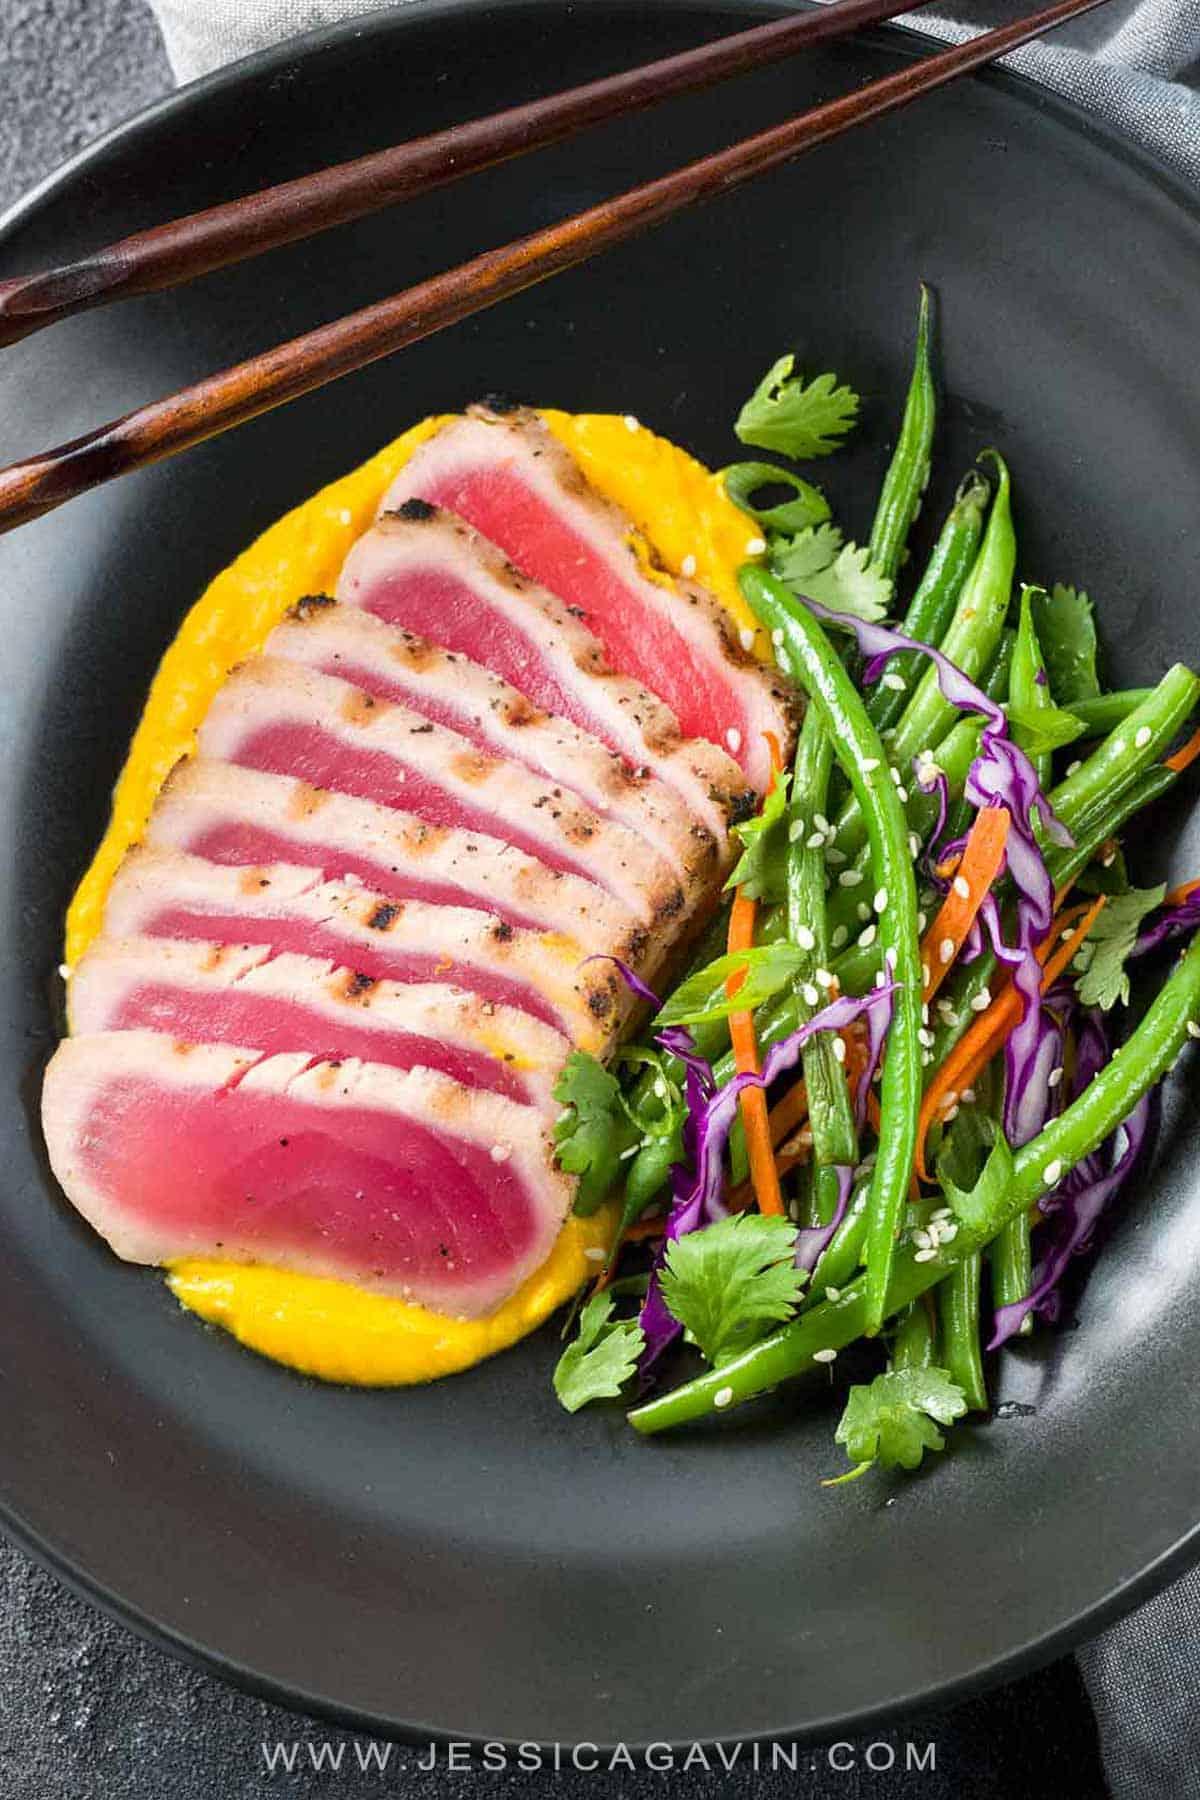 Seared Ahi Tuna with Crispy Sesame Green Beans - A gourmet recipe made right at home! Silky cauliflower carrot ginger puree adds a touch of elegance with ease. #searedahi #ahituna #japanese #tunarecipe